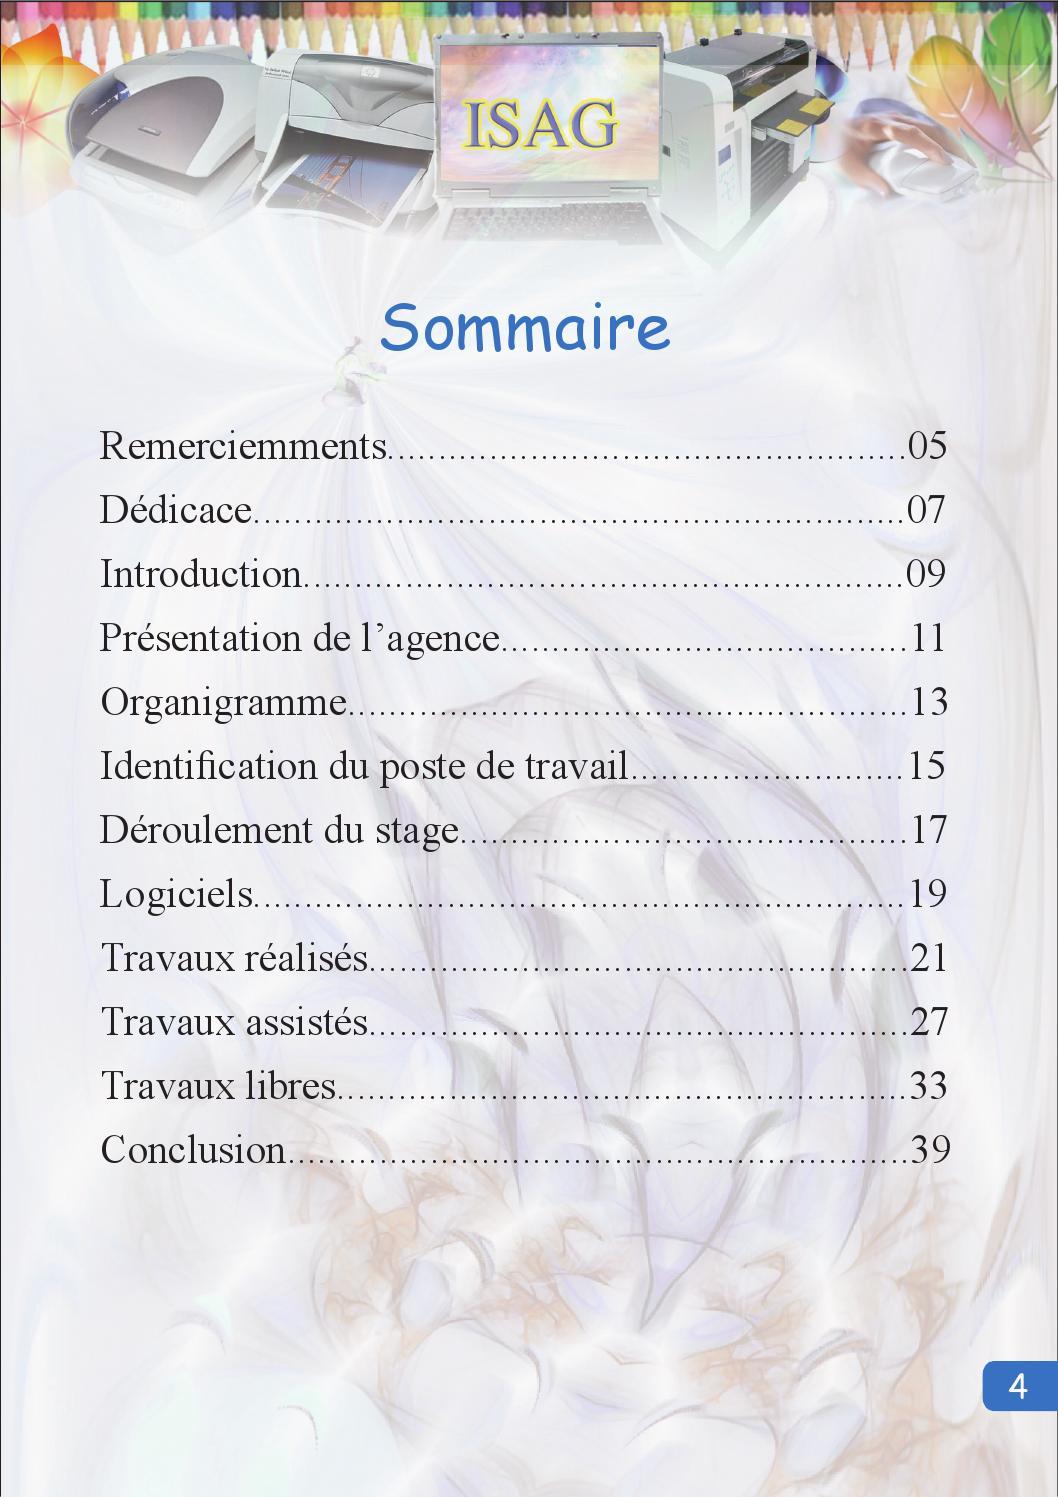 Rapport De Stage Abdelkerim Souali Issuu Scribd